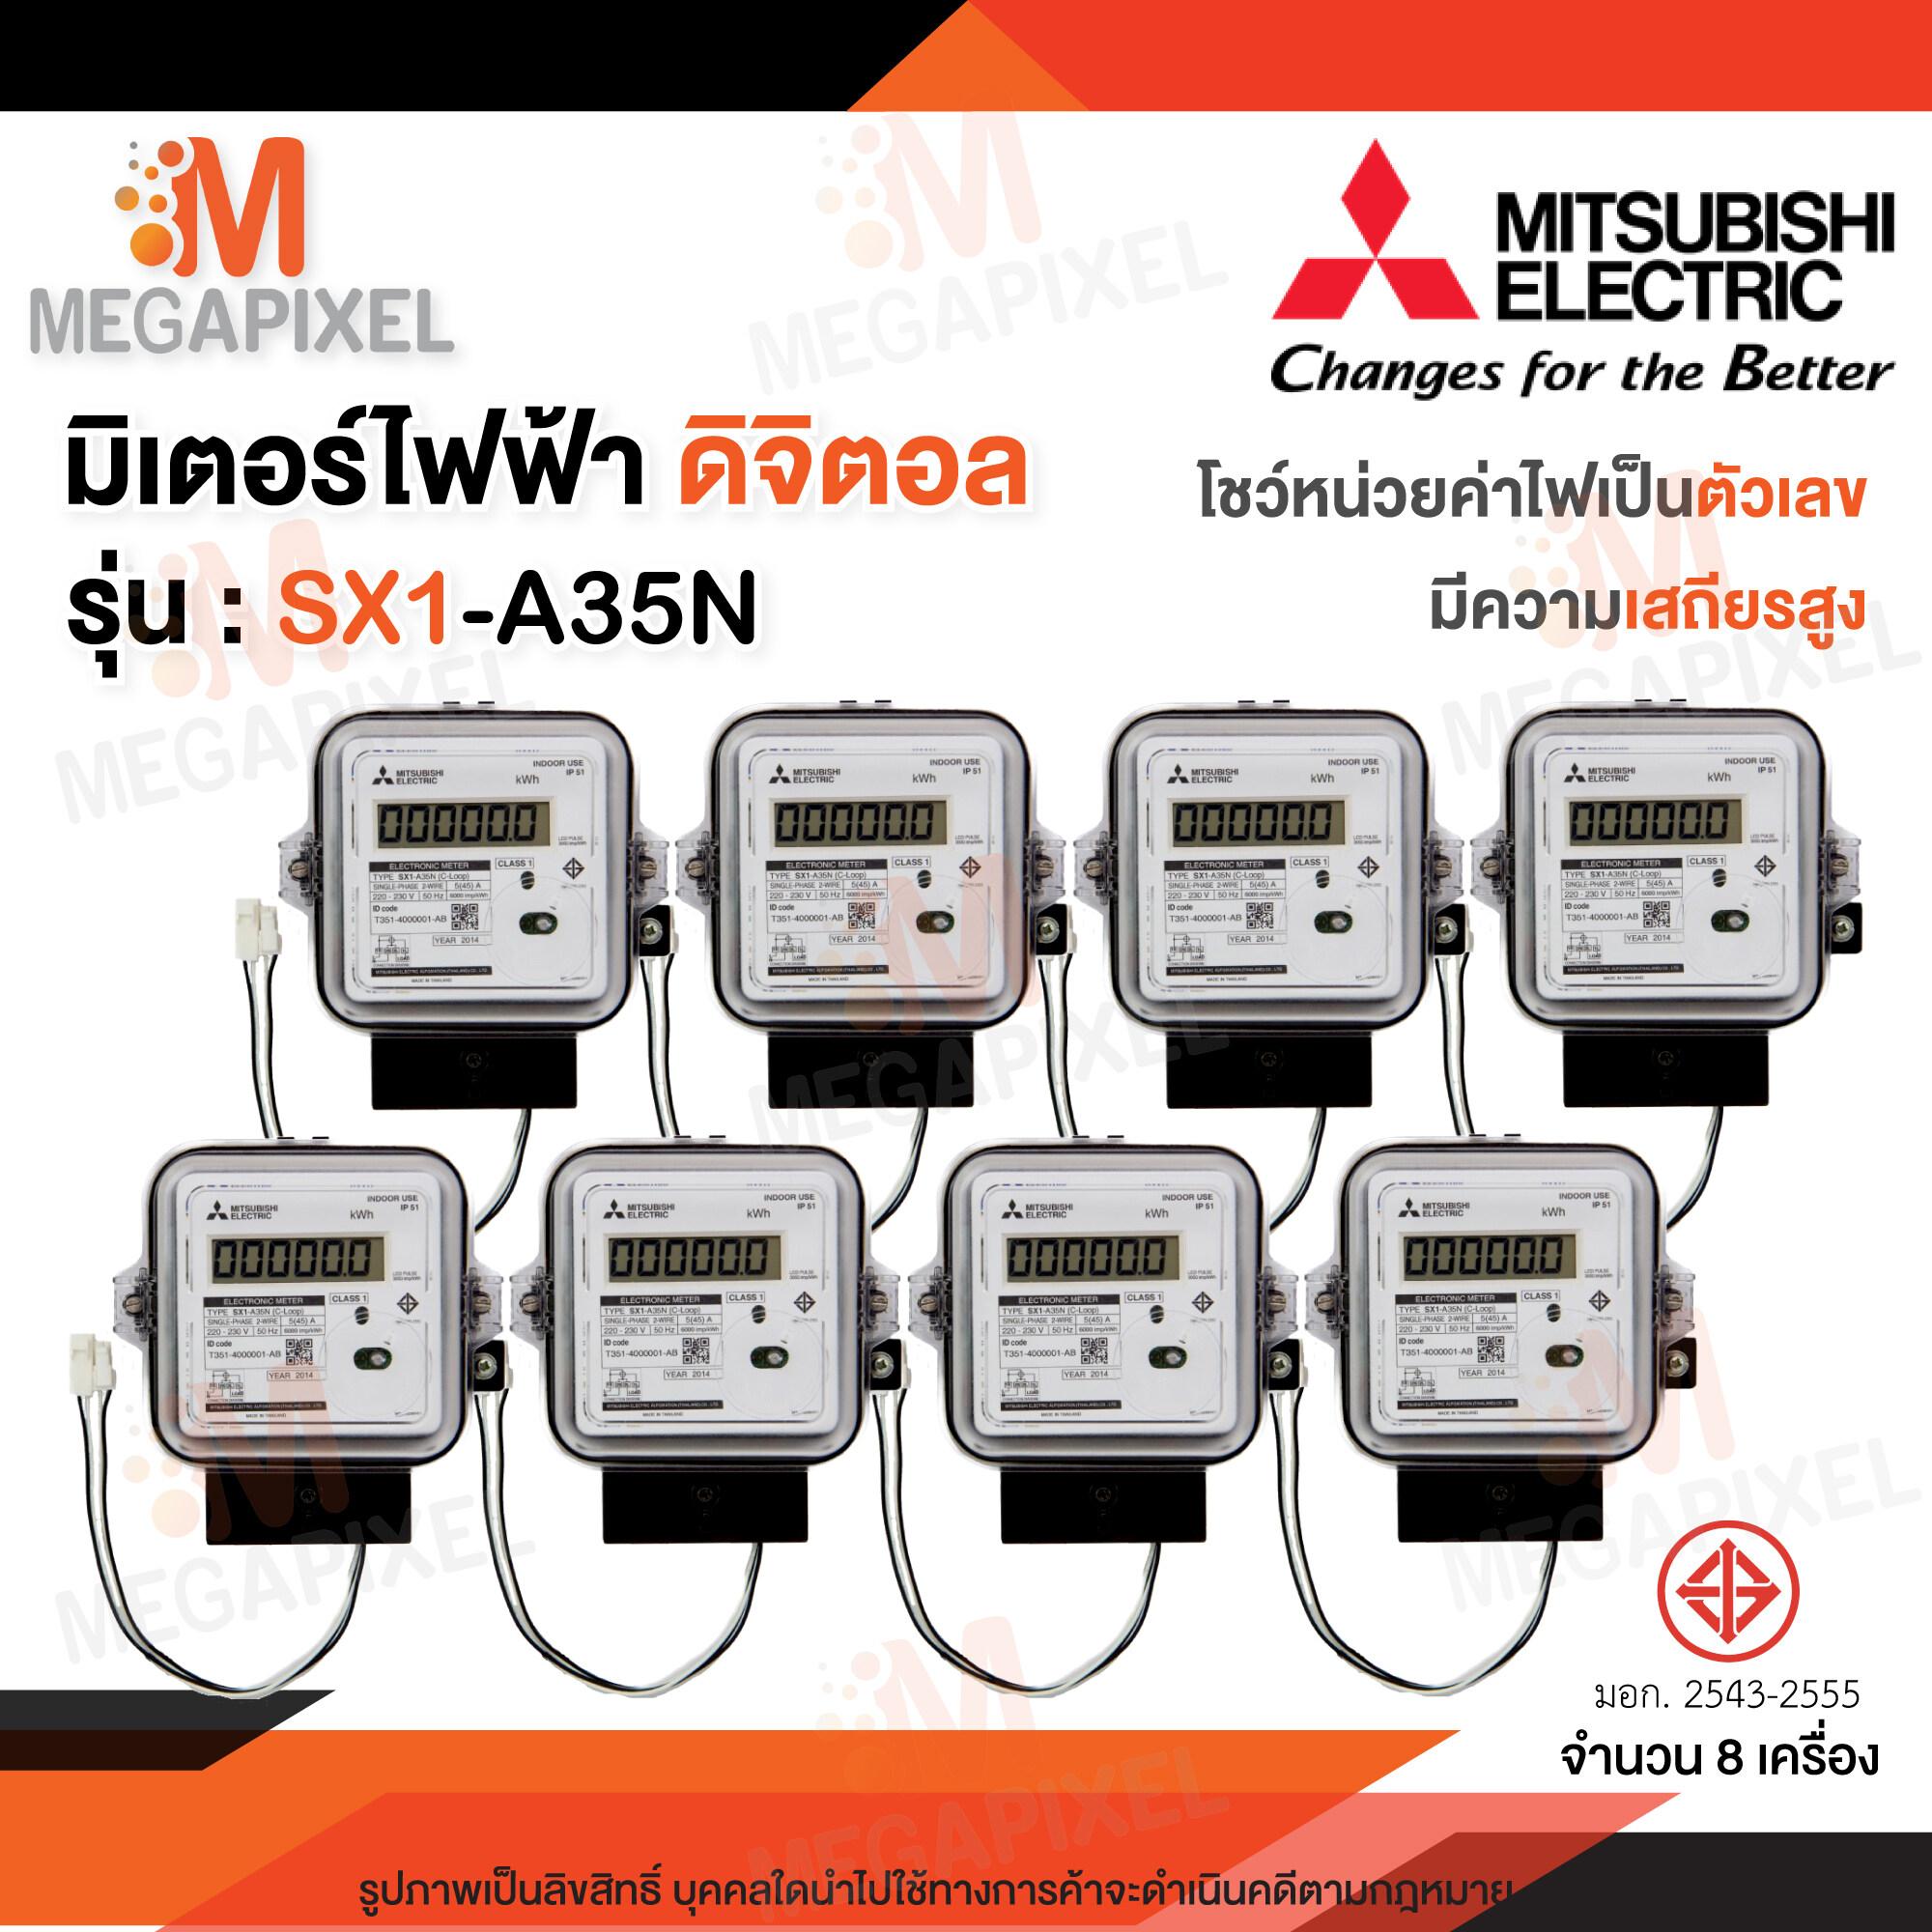 Mitsubishi มิเตอร์ไฟฟ้า รุ่น SX1-A35N 5(45)A มิเตอร์ดิจิตอล สำหรับห้องพัก โชว์หน่วยค่าไฟเป็นตัวเลข มีความเสถียรสูง มิเตอร์ไฟฟ้าดิจิตอล